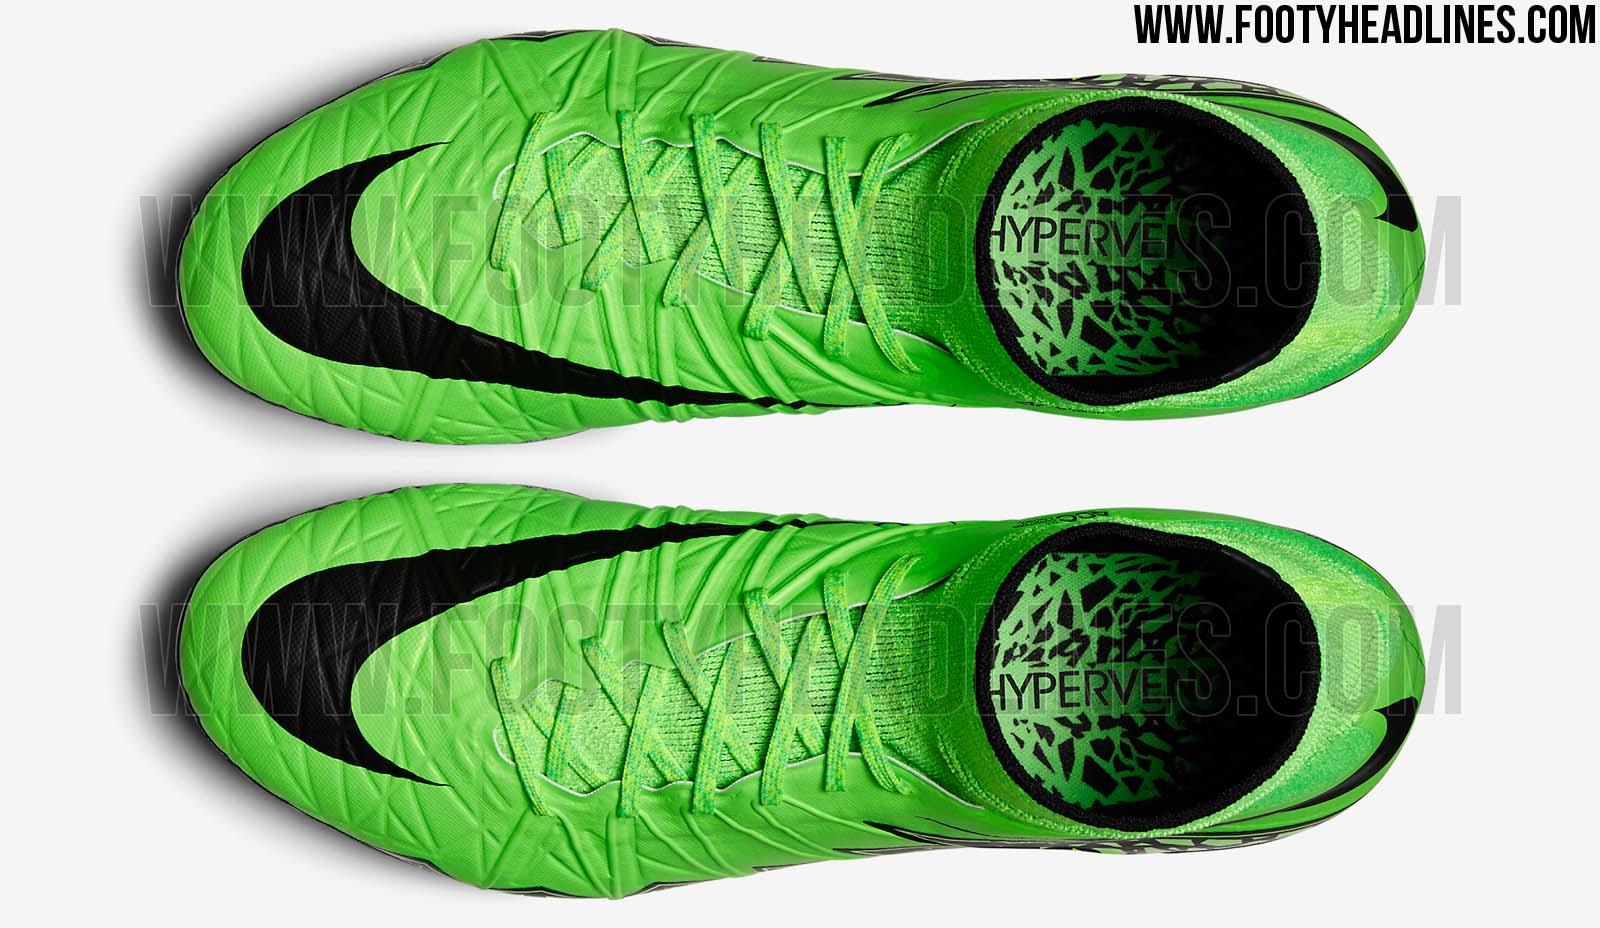 Nike Hypervenom 2 Grün